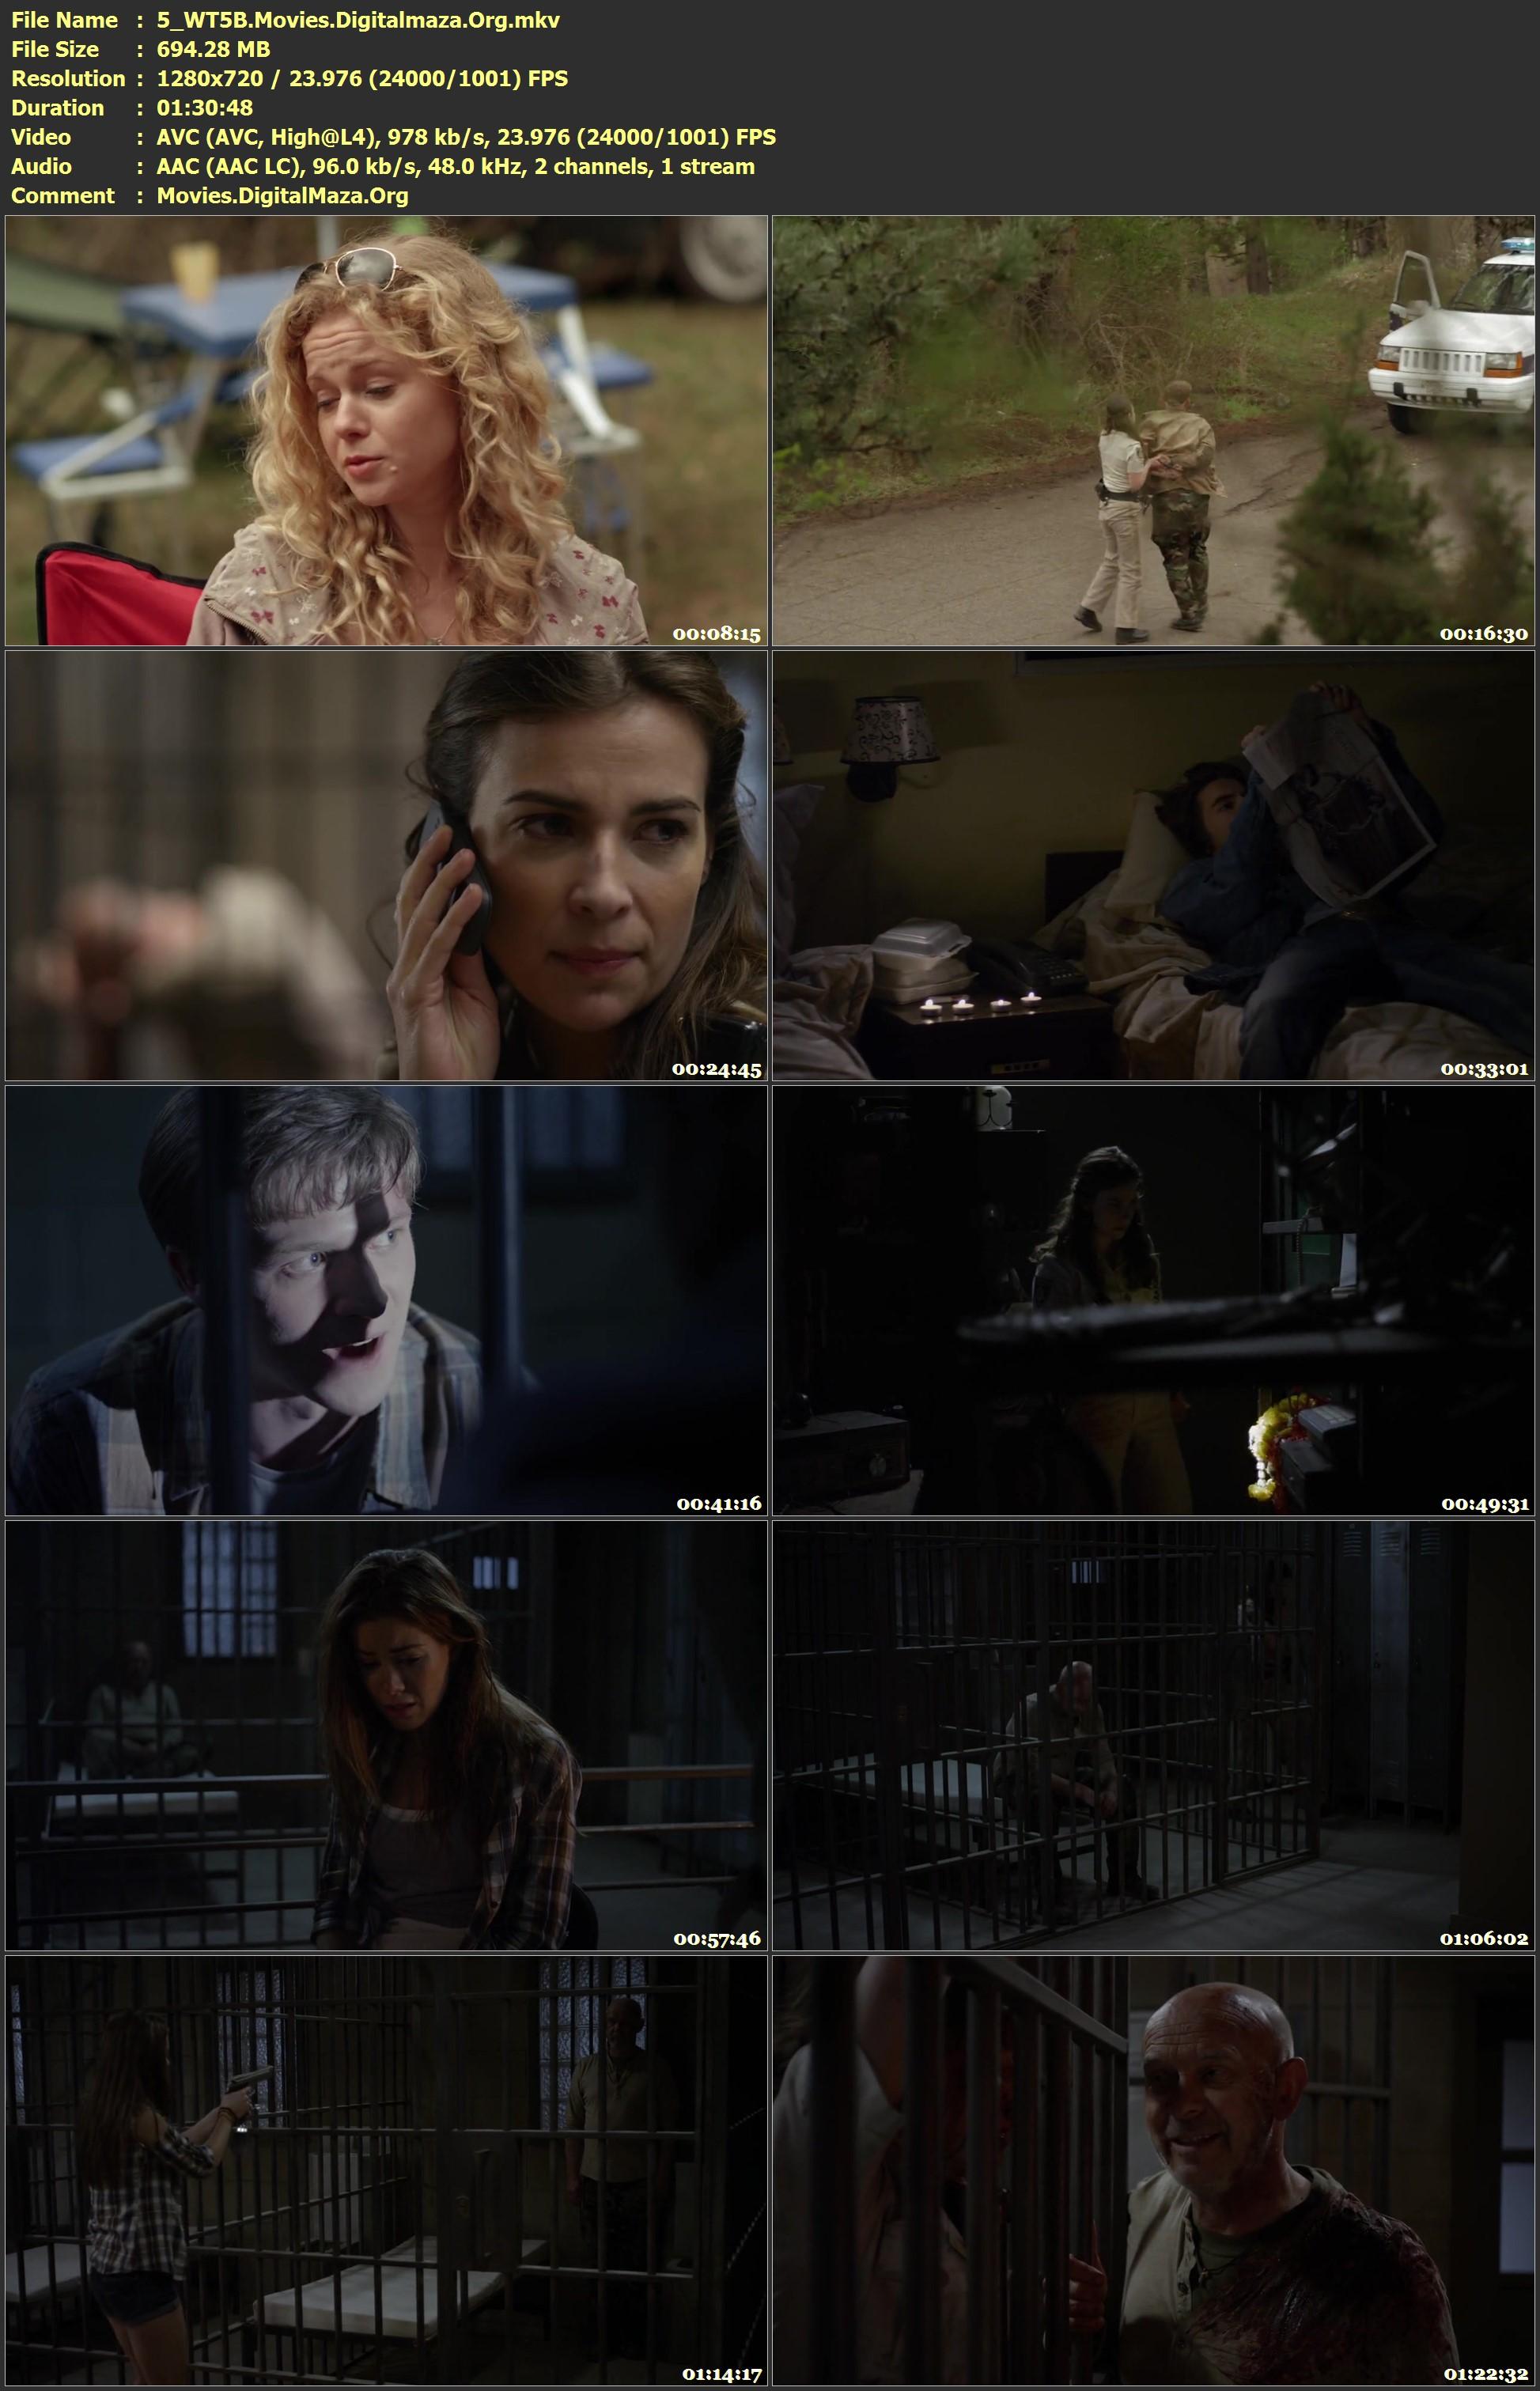 https://image.ibb.co/n805vx/5_WT5_B_Movies_Digitalmaza_Org_mkv.jpg